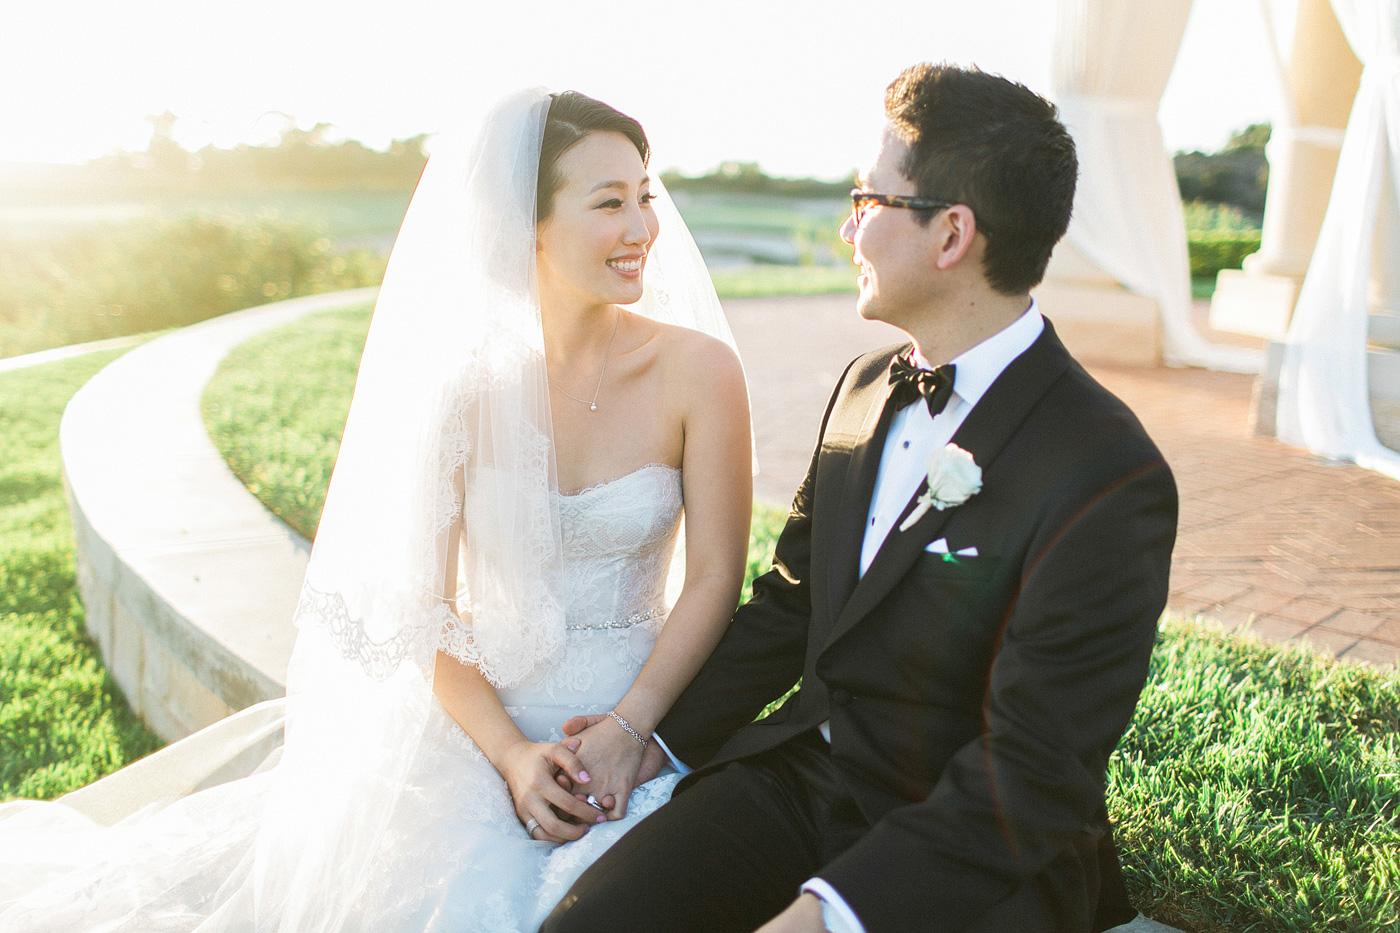 Pelican-hill-wedding-32